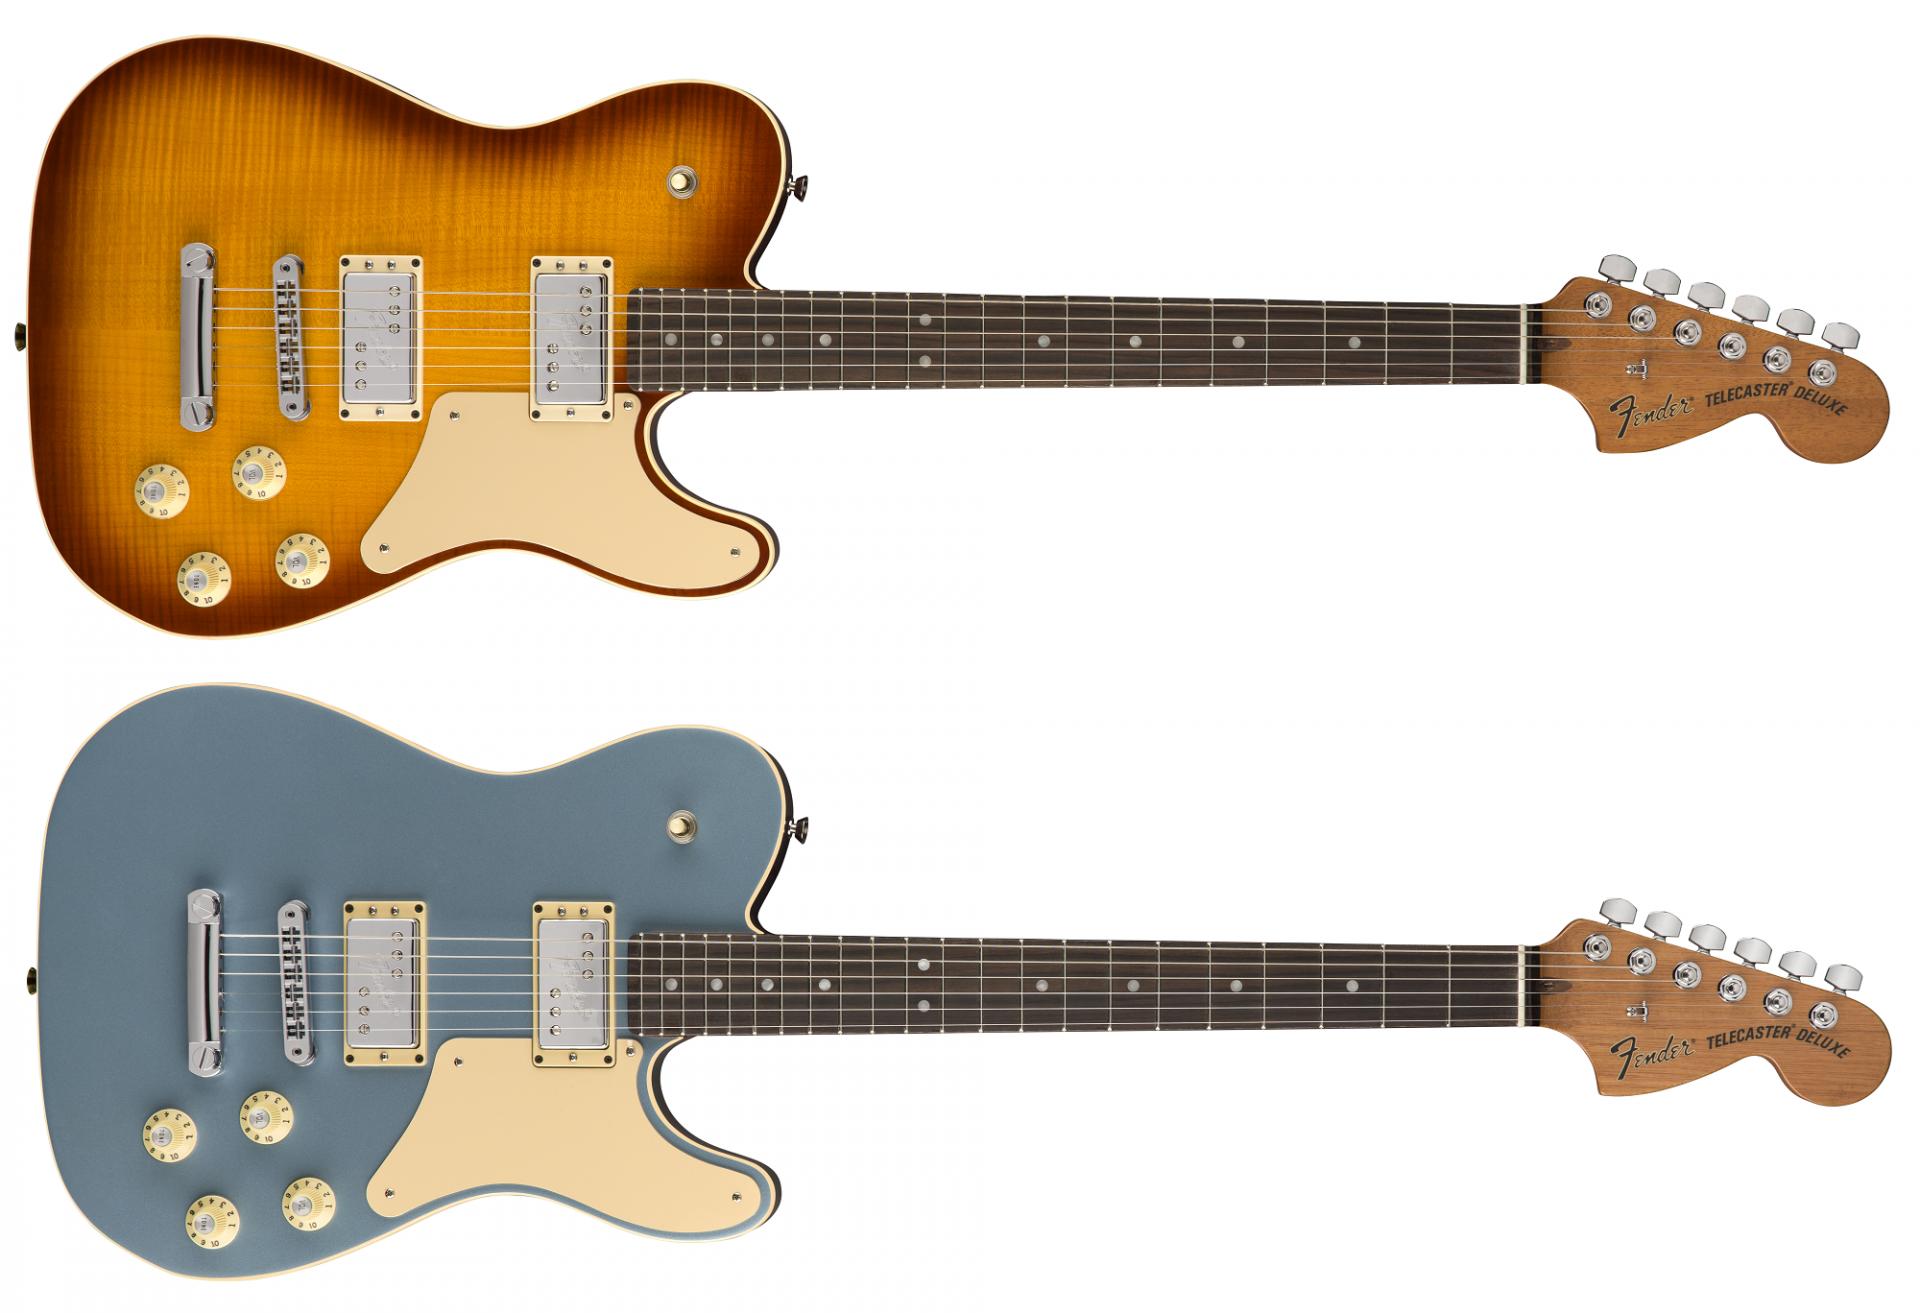 0176020774 Gtr Frt 001 Rr Png 1 920 1 313???????????? Guitar Making Music Electric Guitar